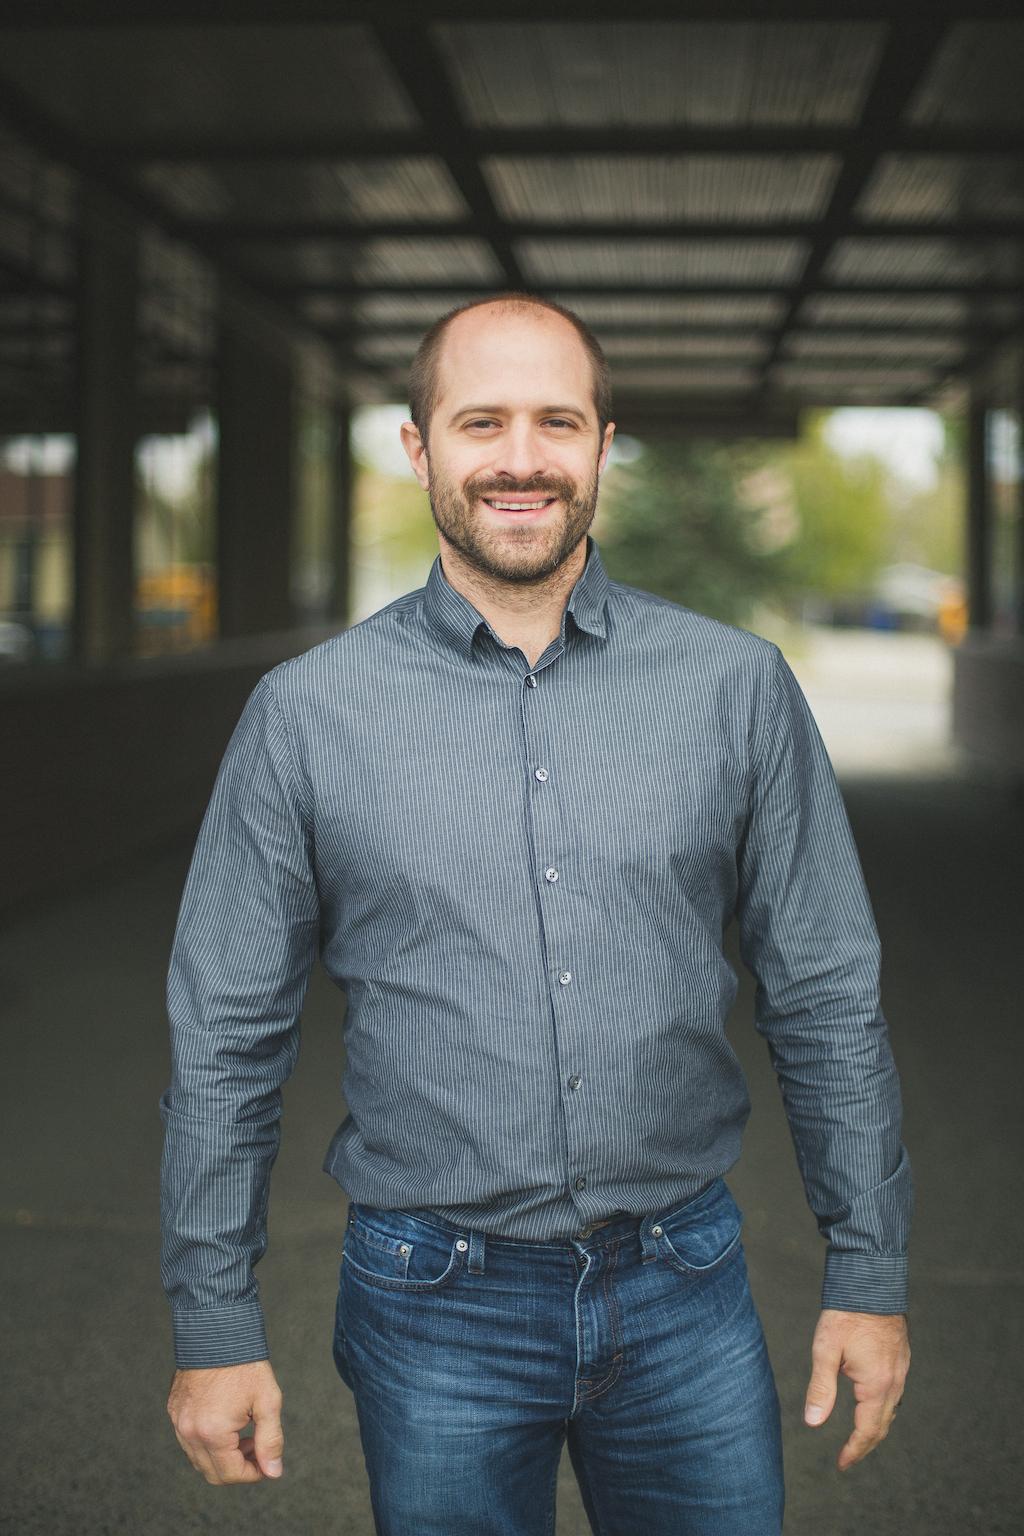 Meet Our Team - Rhett - iOS Developer